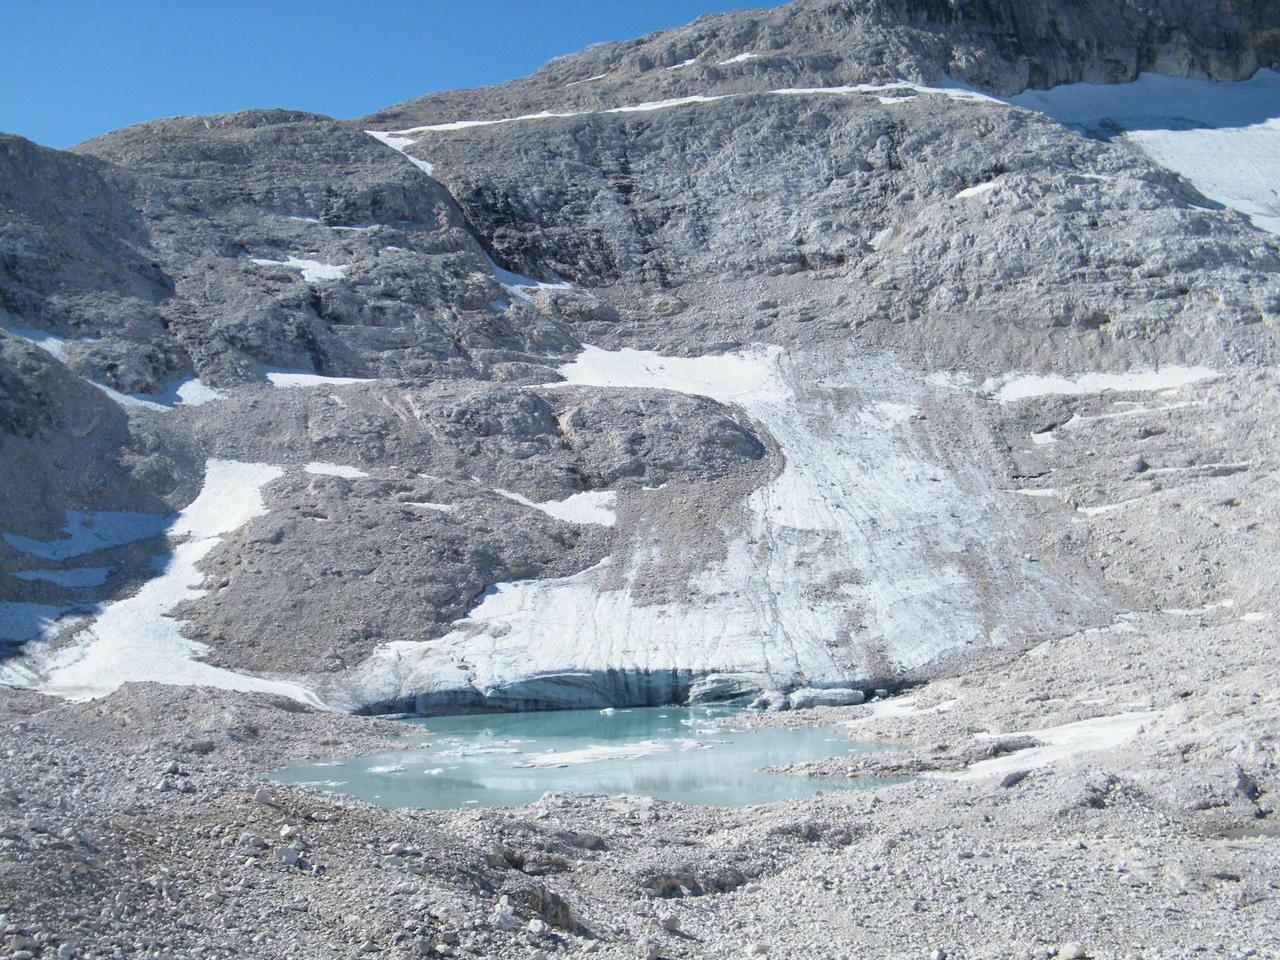 ghiacciaio della fradusta-dscf6383.jpg